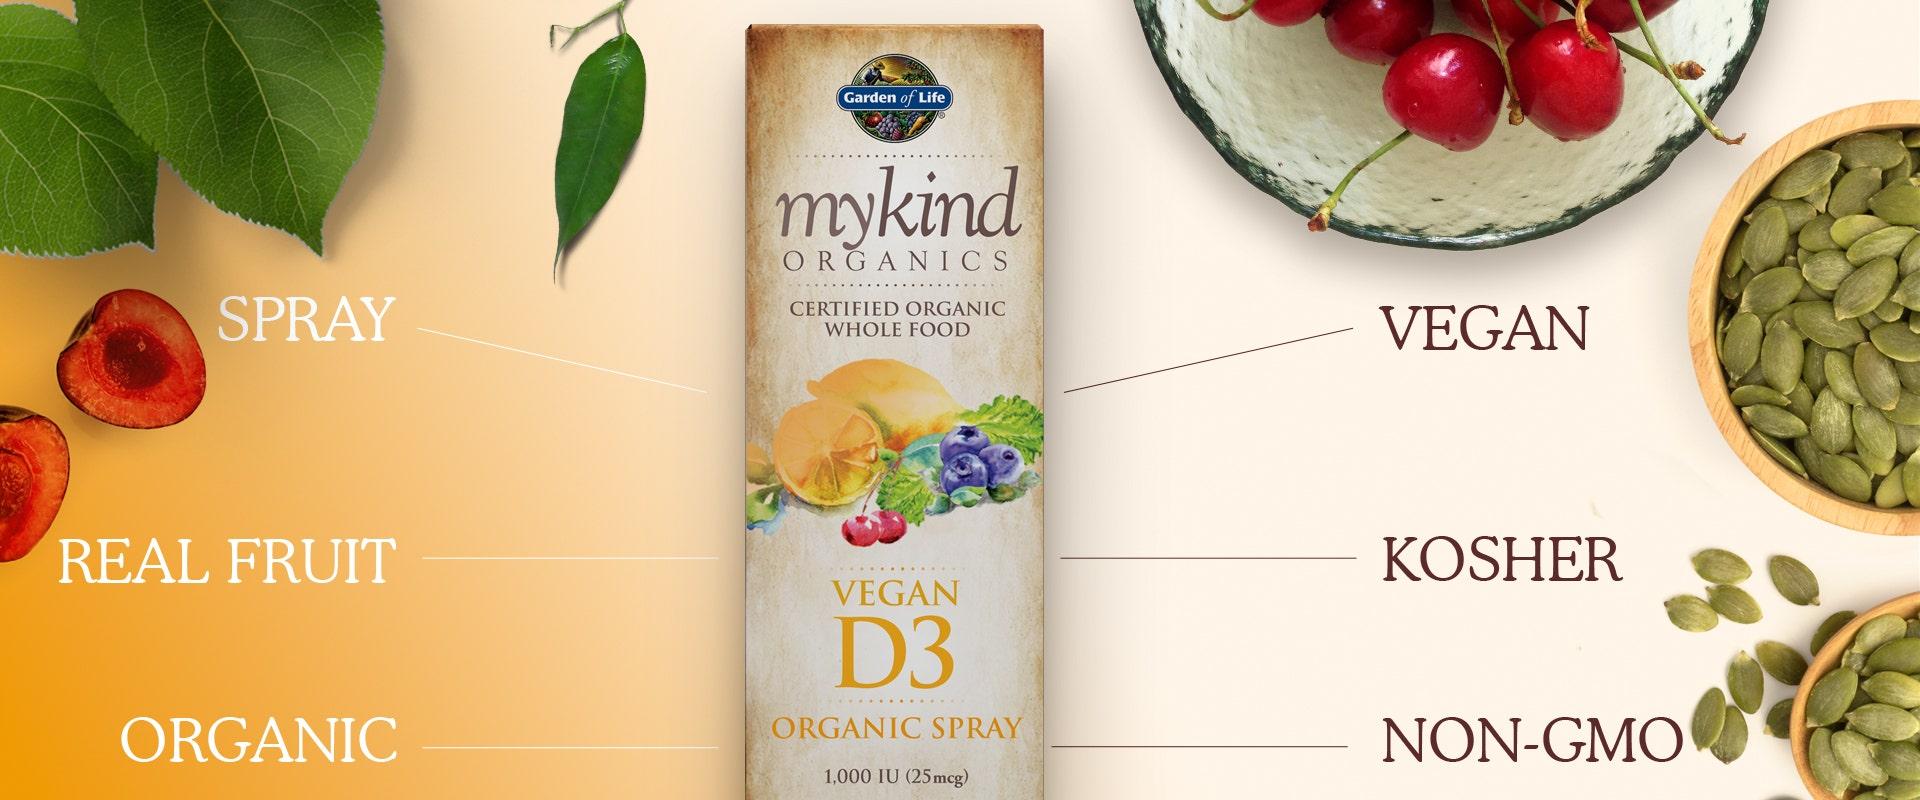 Garden of Life mykind Vitamin D3 Spray Vegan